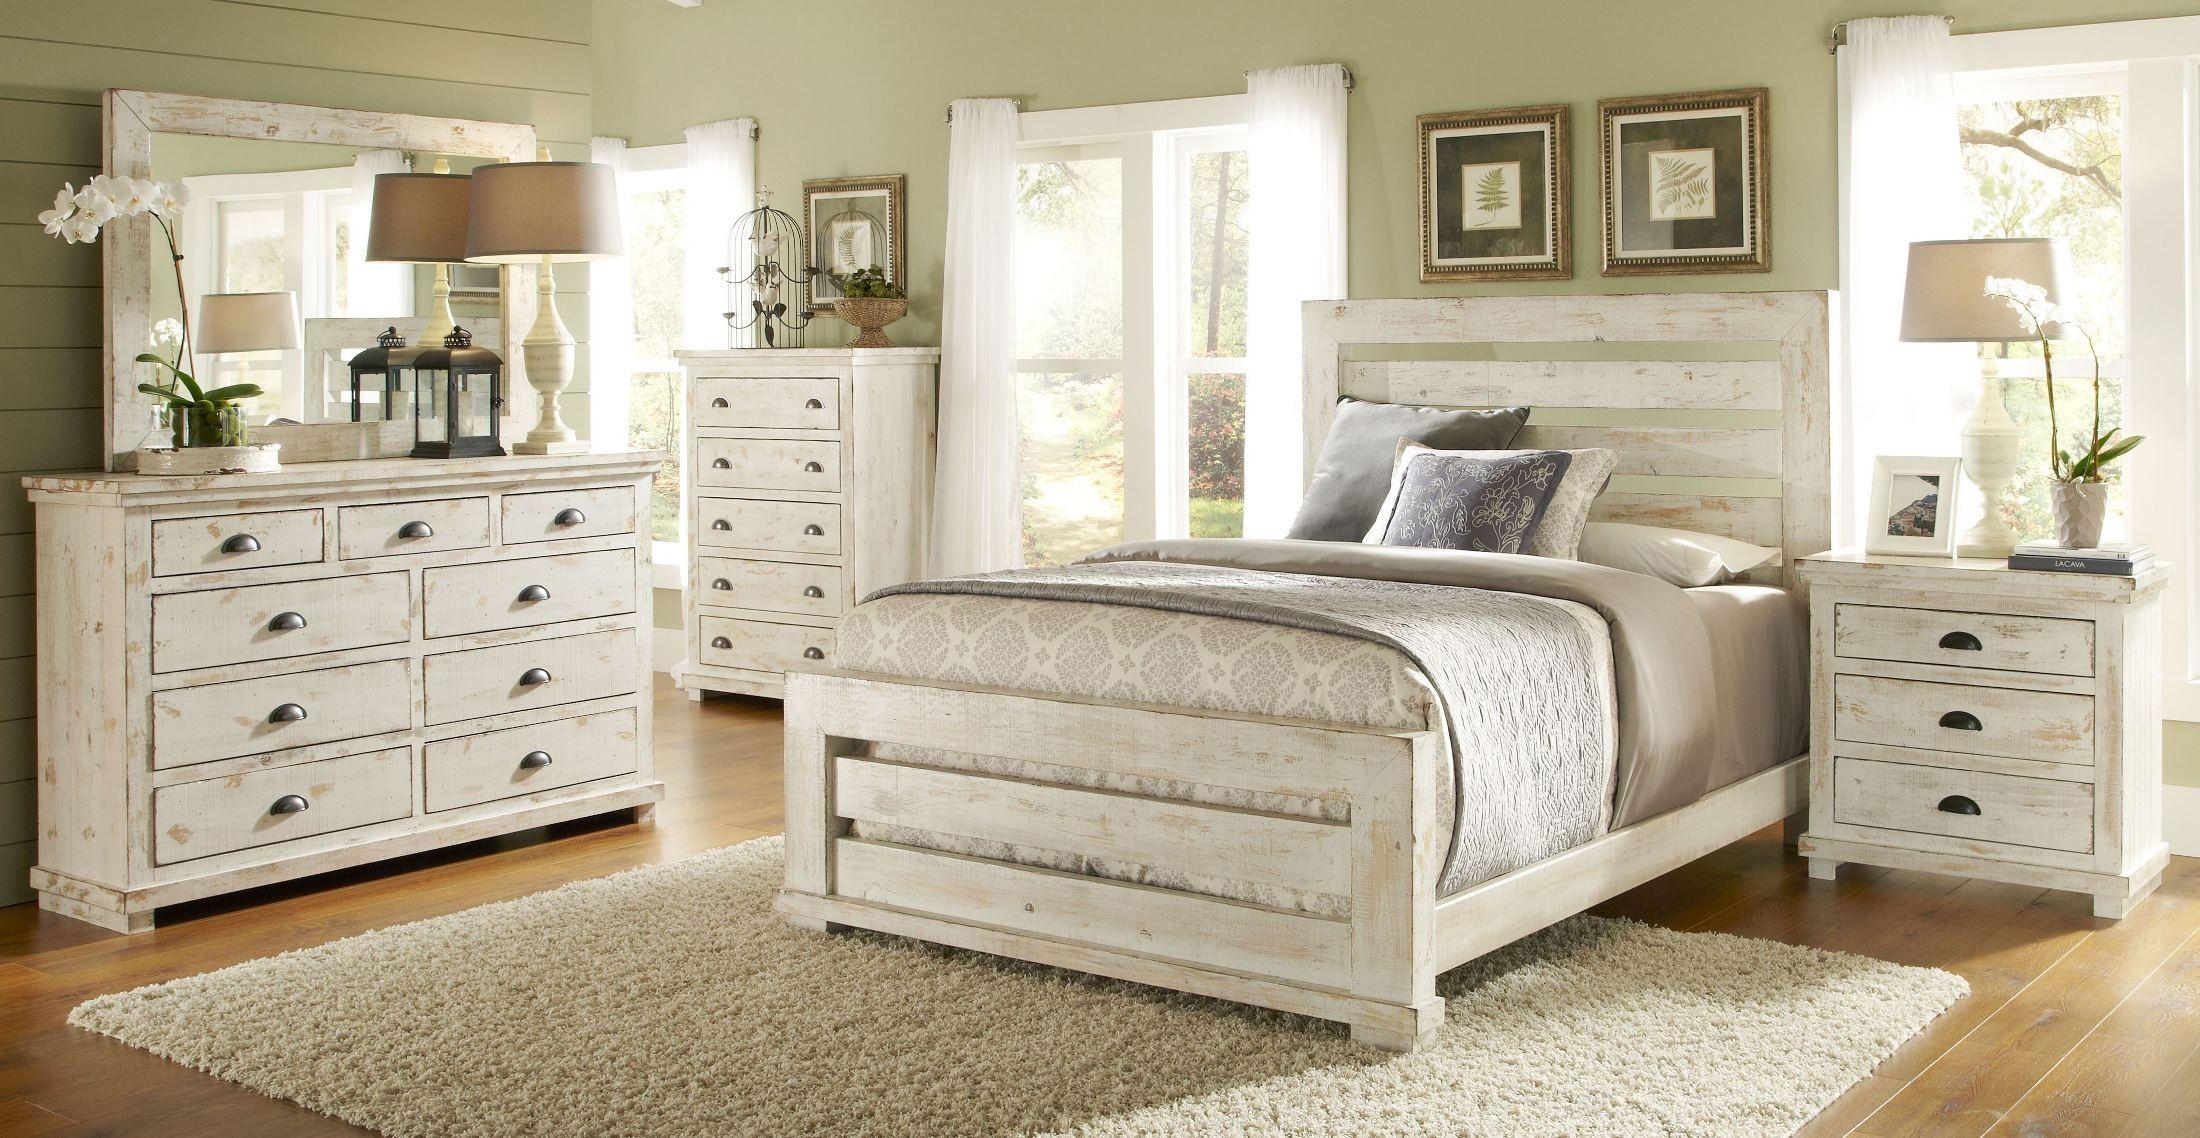 willow distressed white slat bedroom set p610 60 61 78 progressive